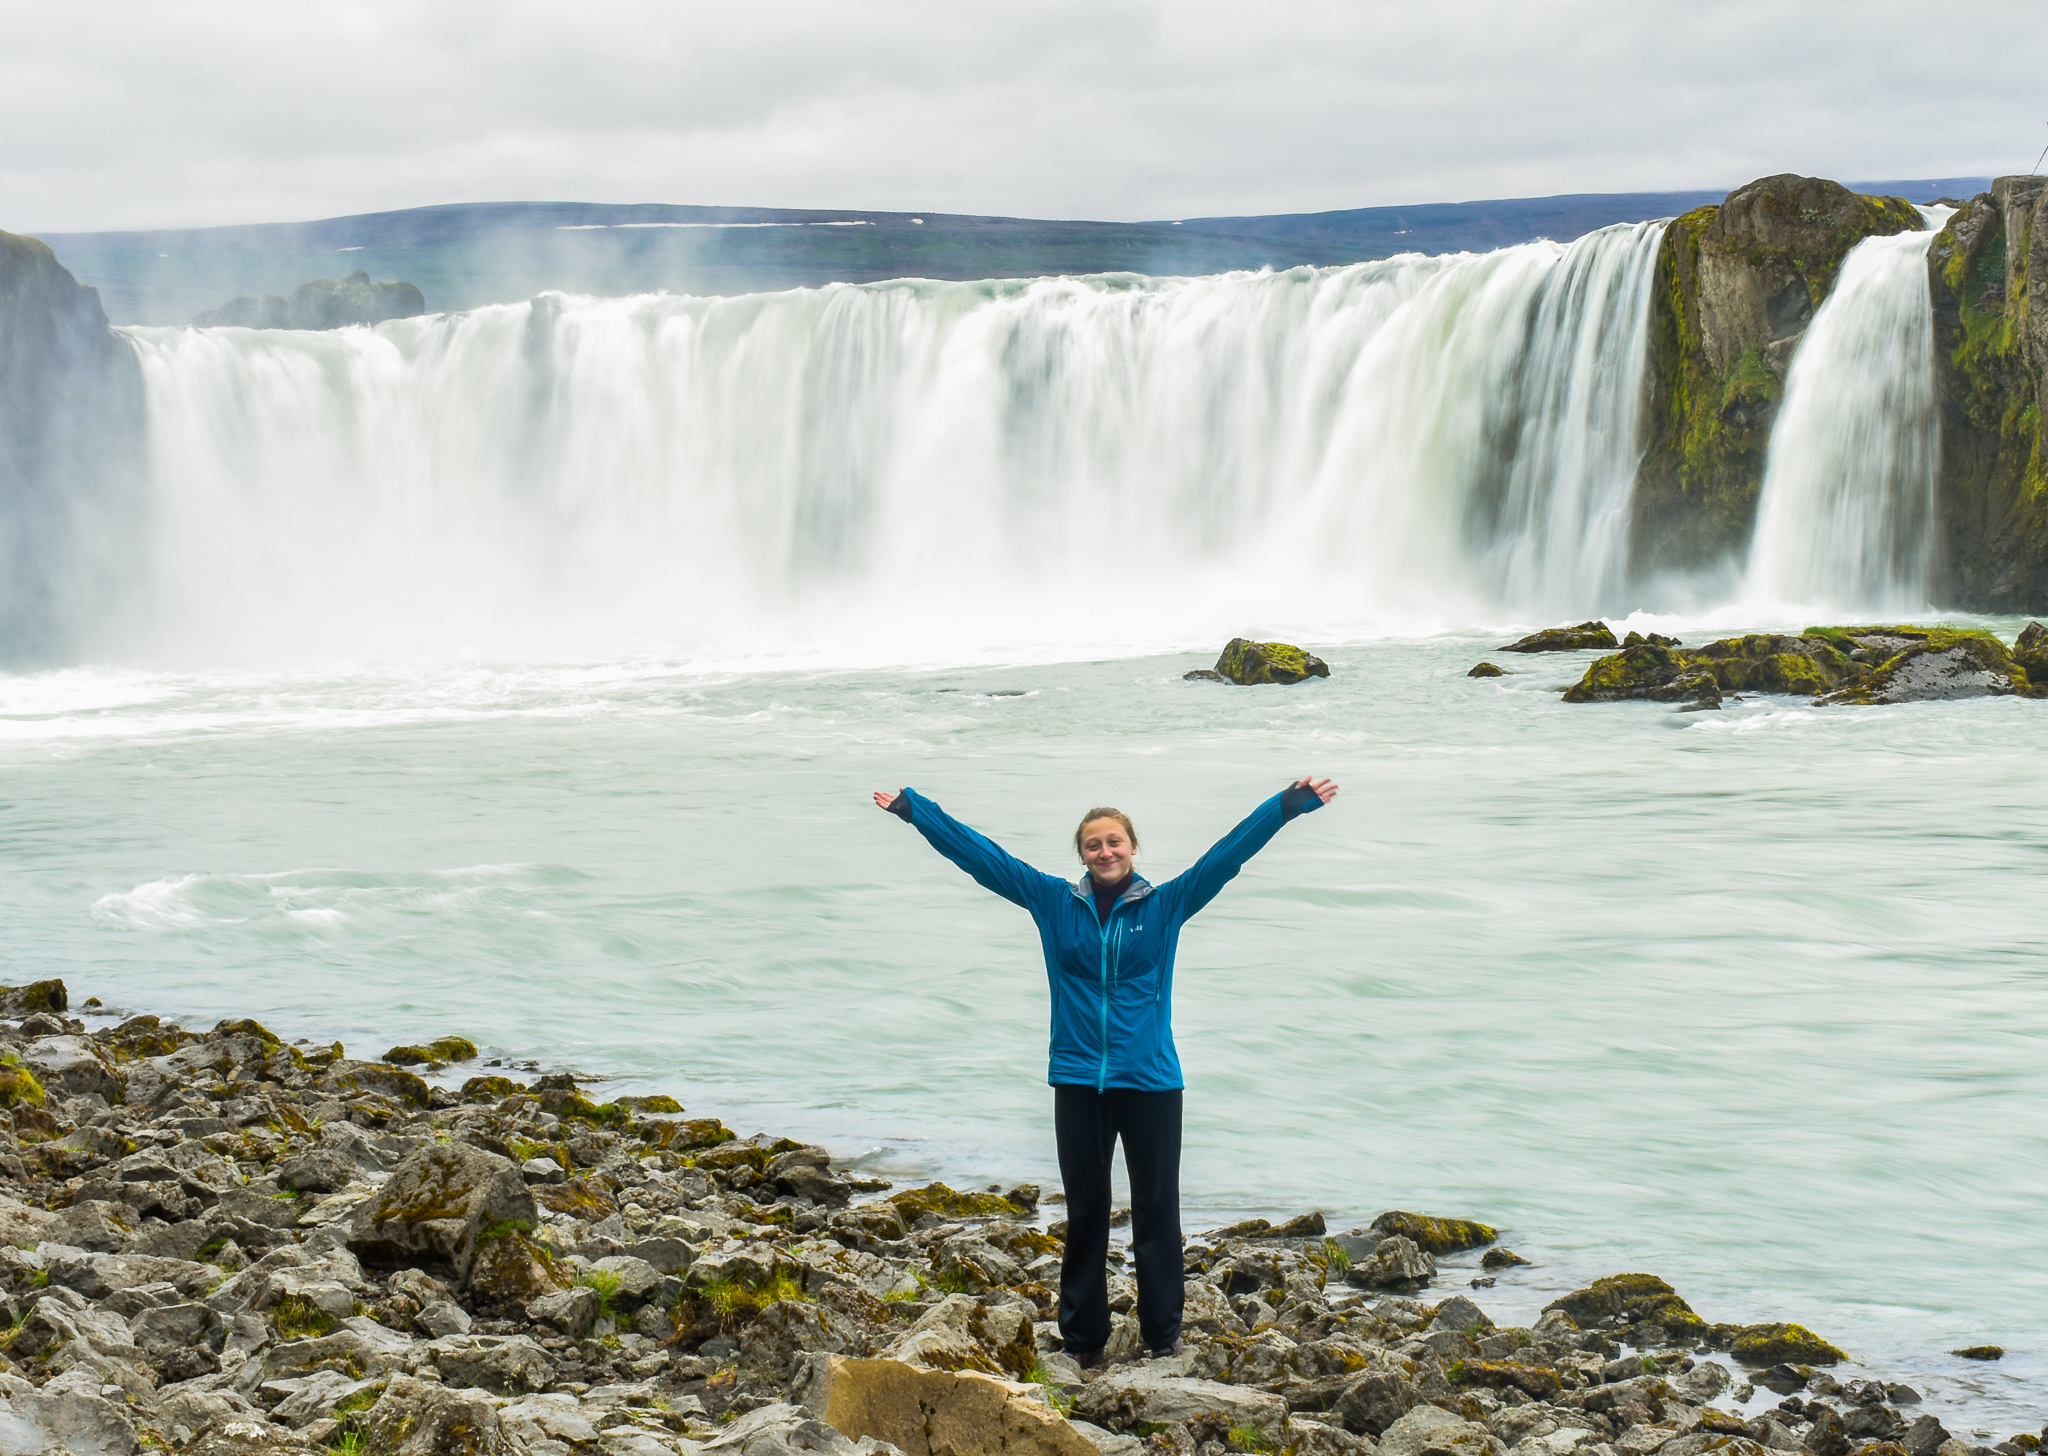 Summer Program - Group Travel | Travel For Teens: Europe for Older Teens - Iceland Adventure